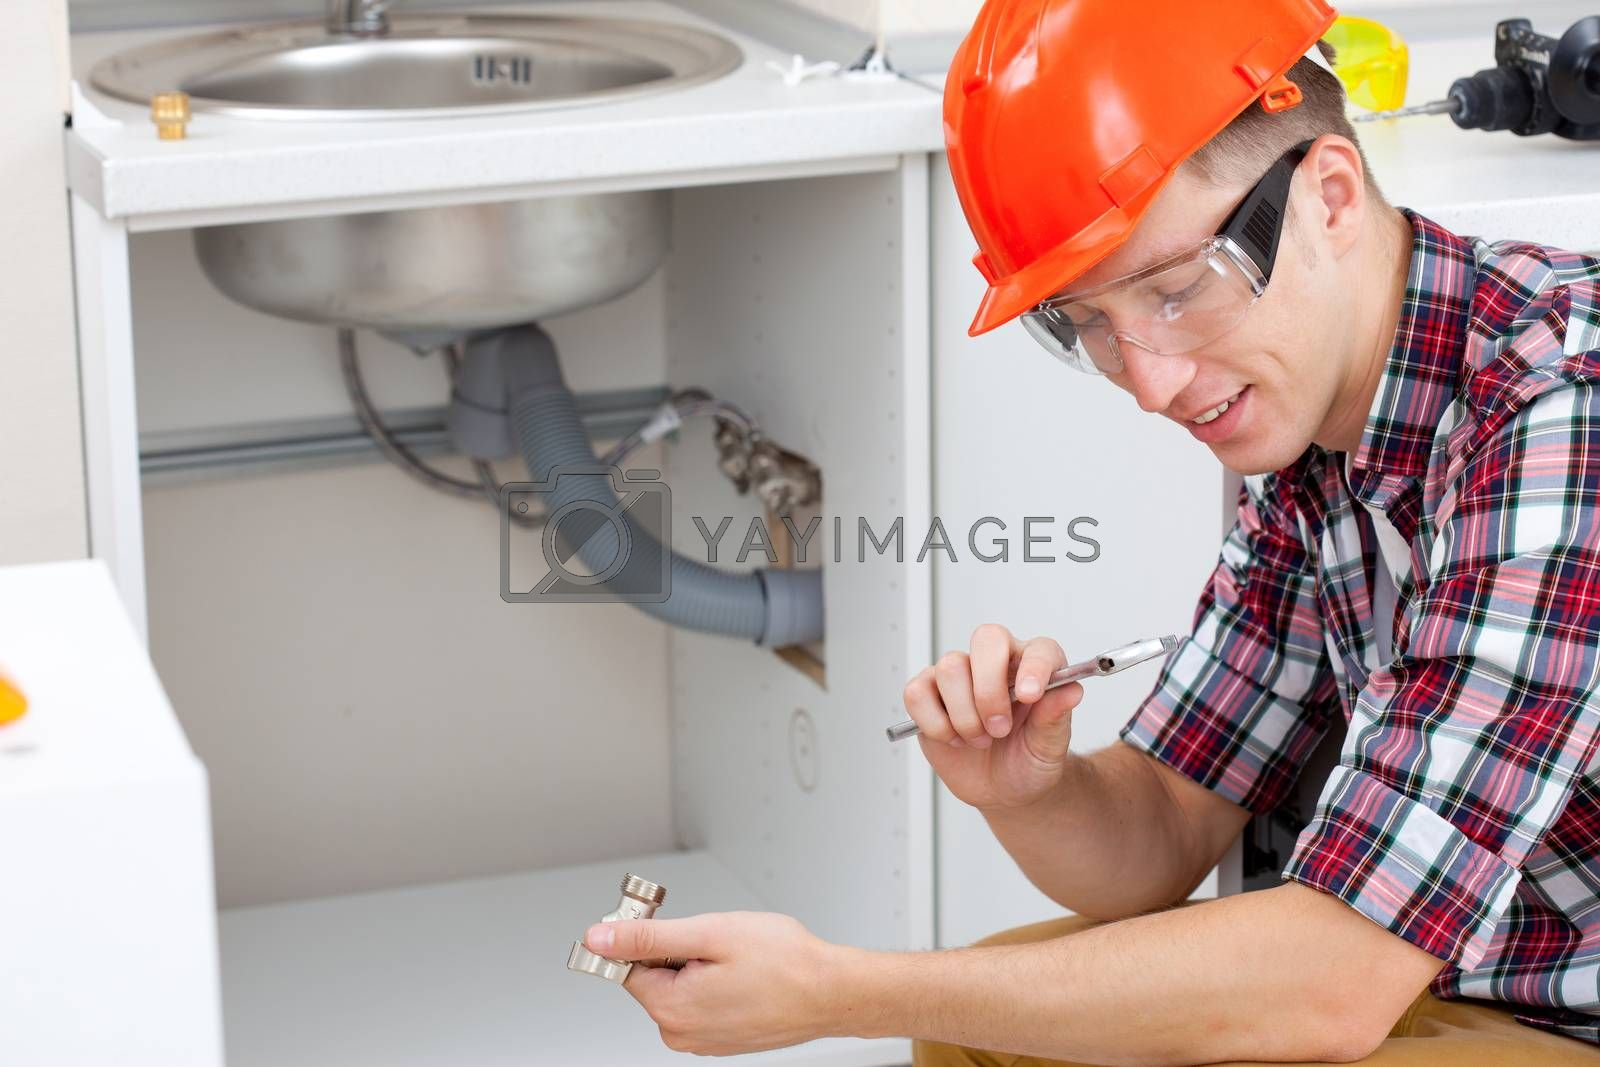 smiling mechanic adjusts the key near the kitchen sink